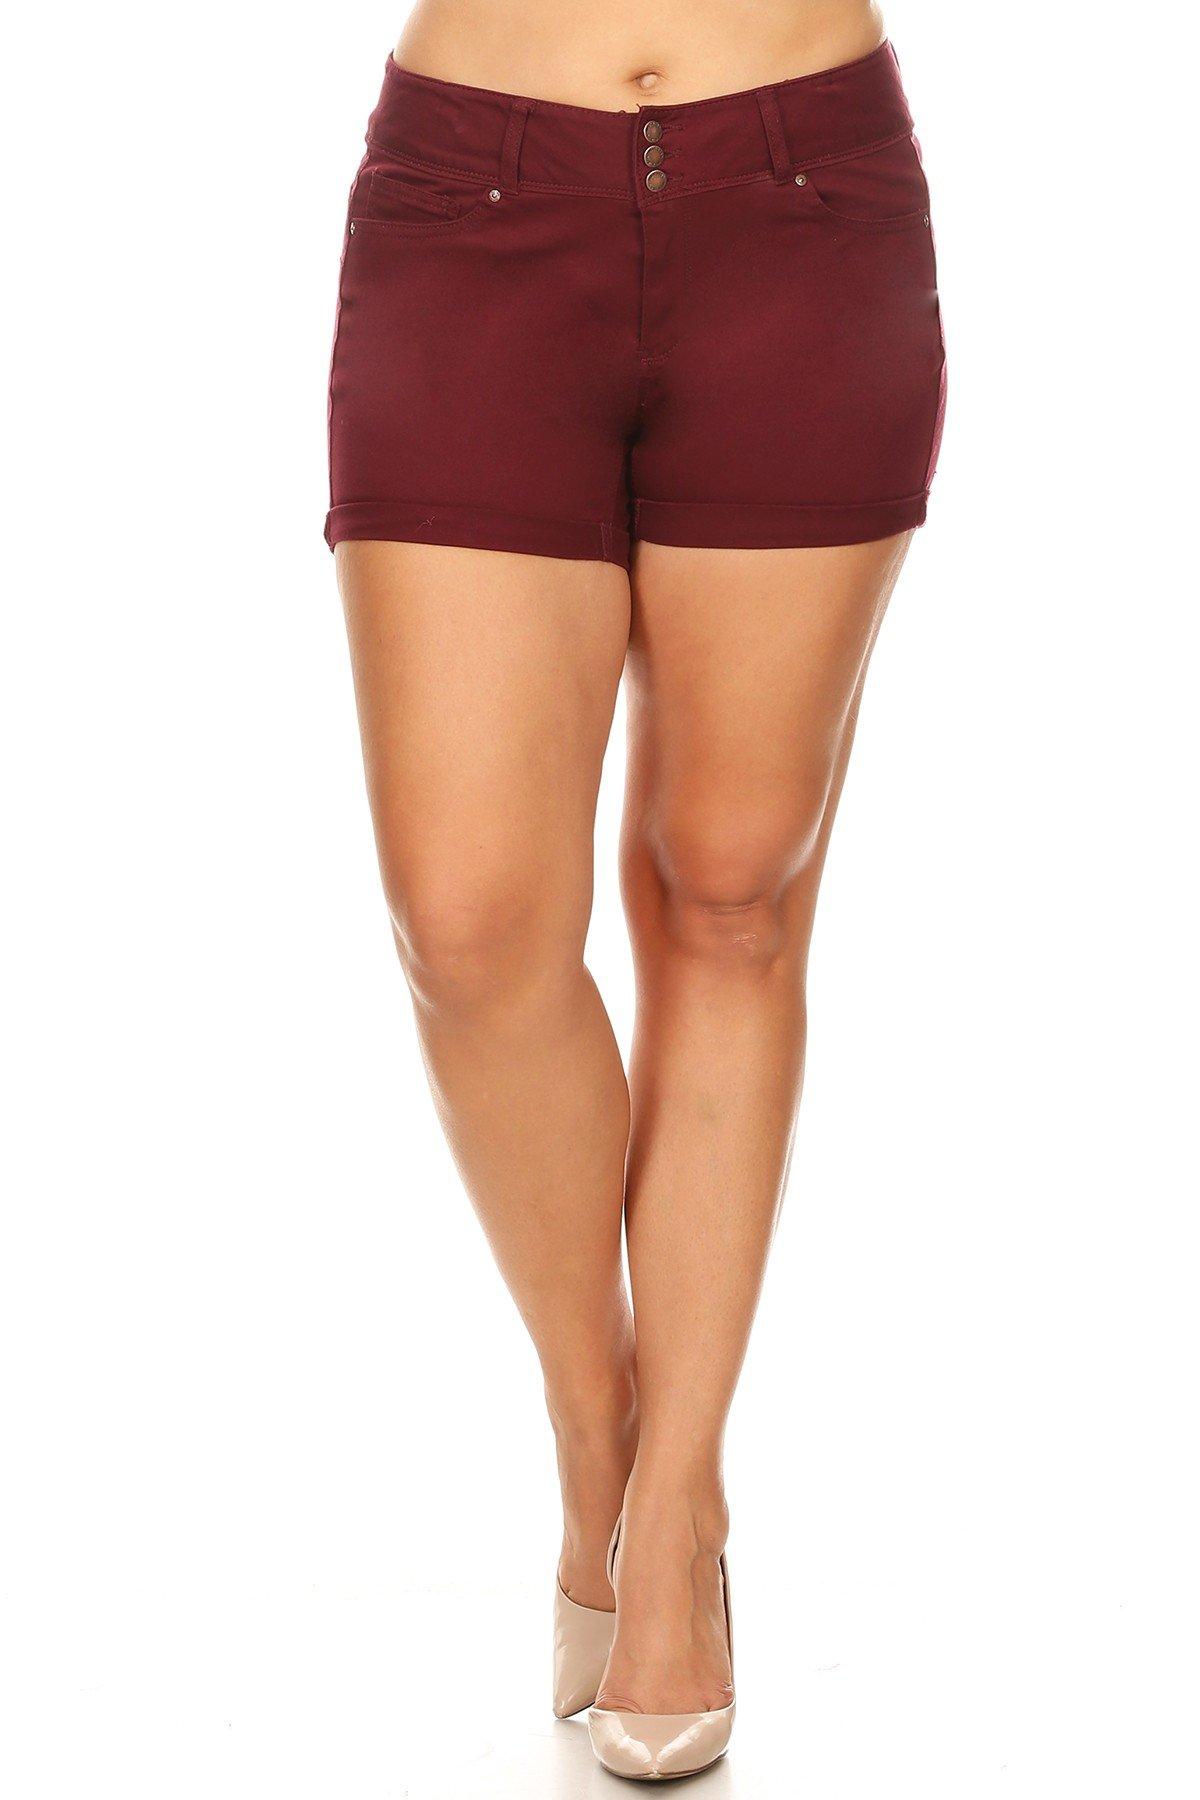 Ambiance Apparel Women's Plus Size Colored Denim Shorts (1X, Burgundy)